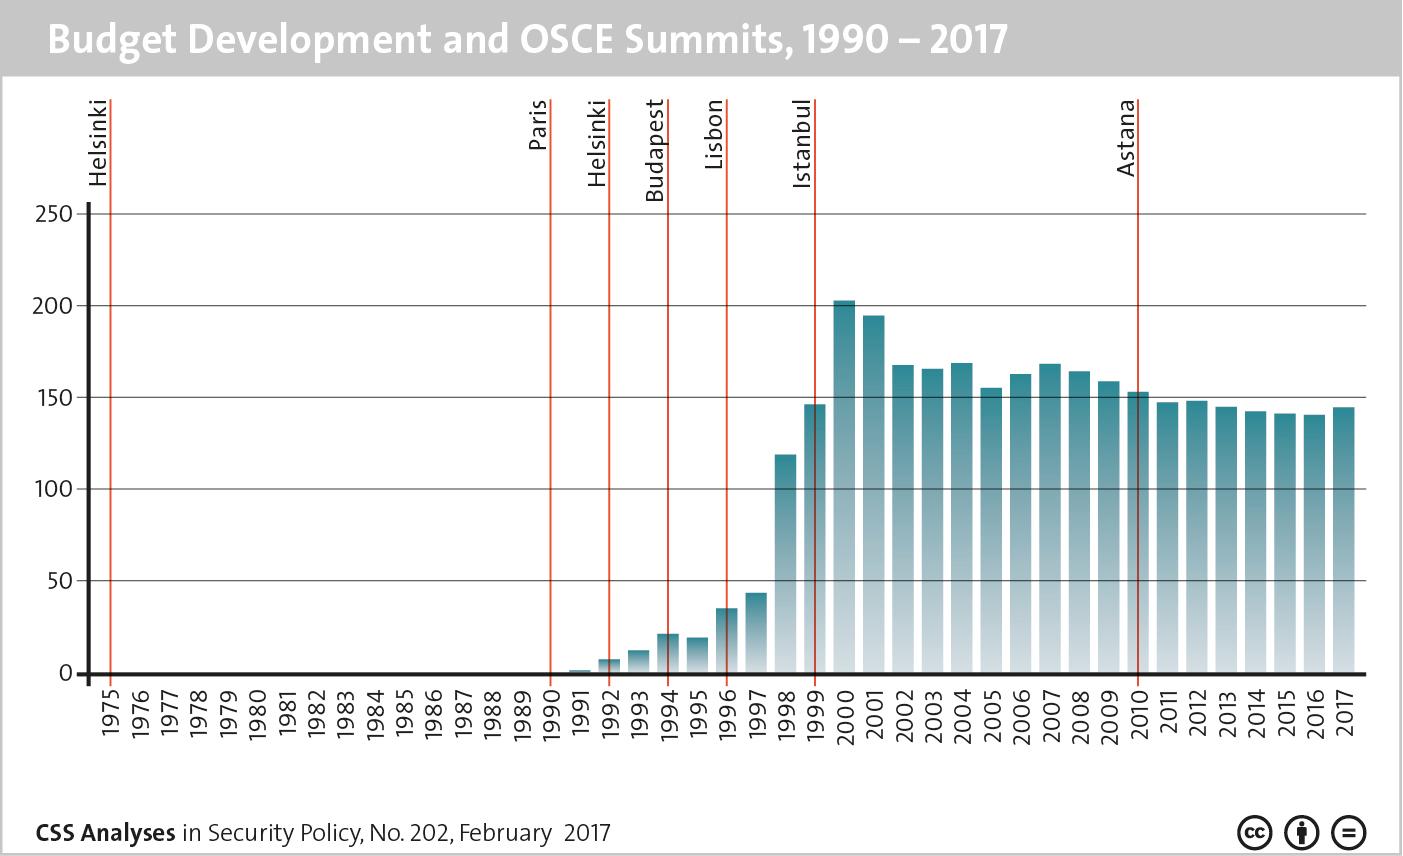 Budget Development and OSCE Summits